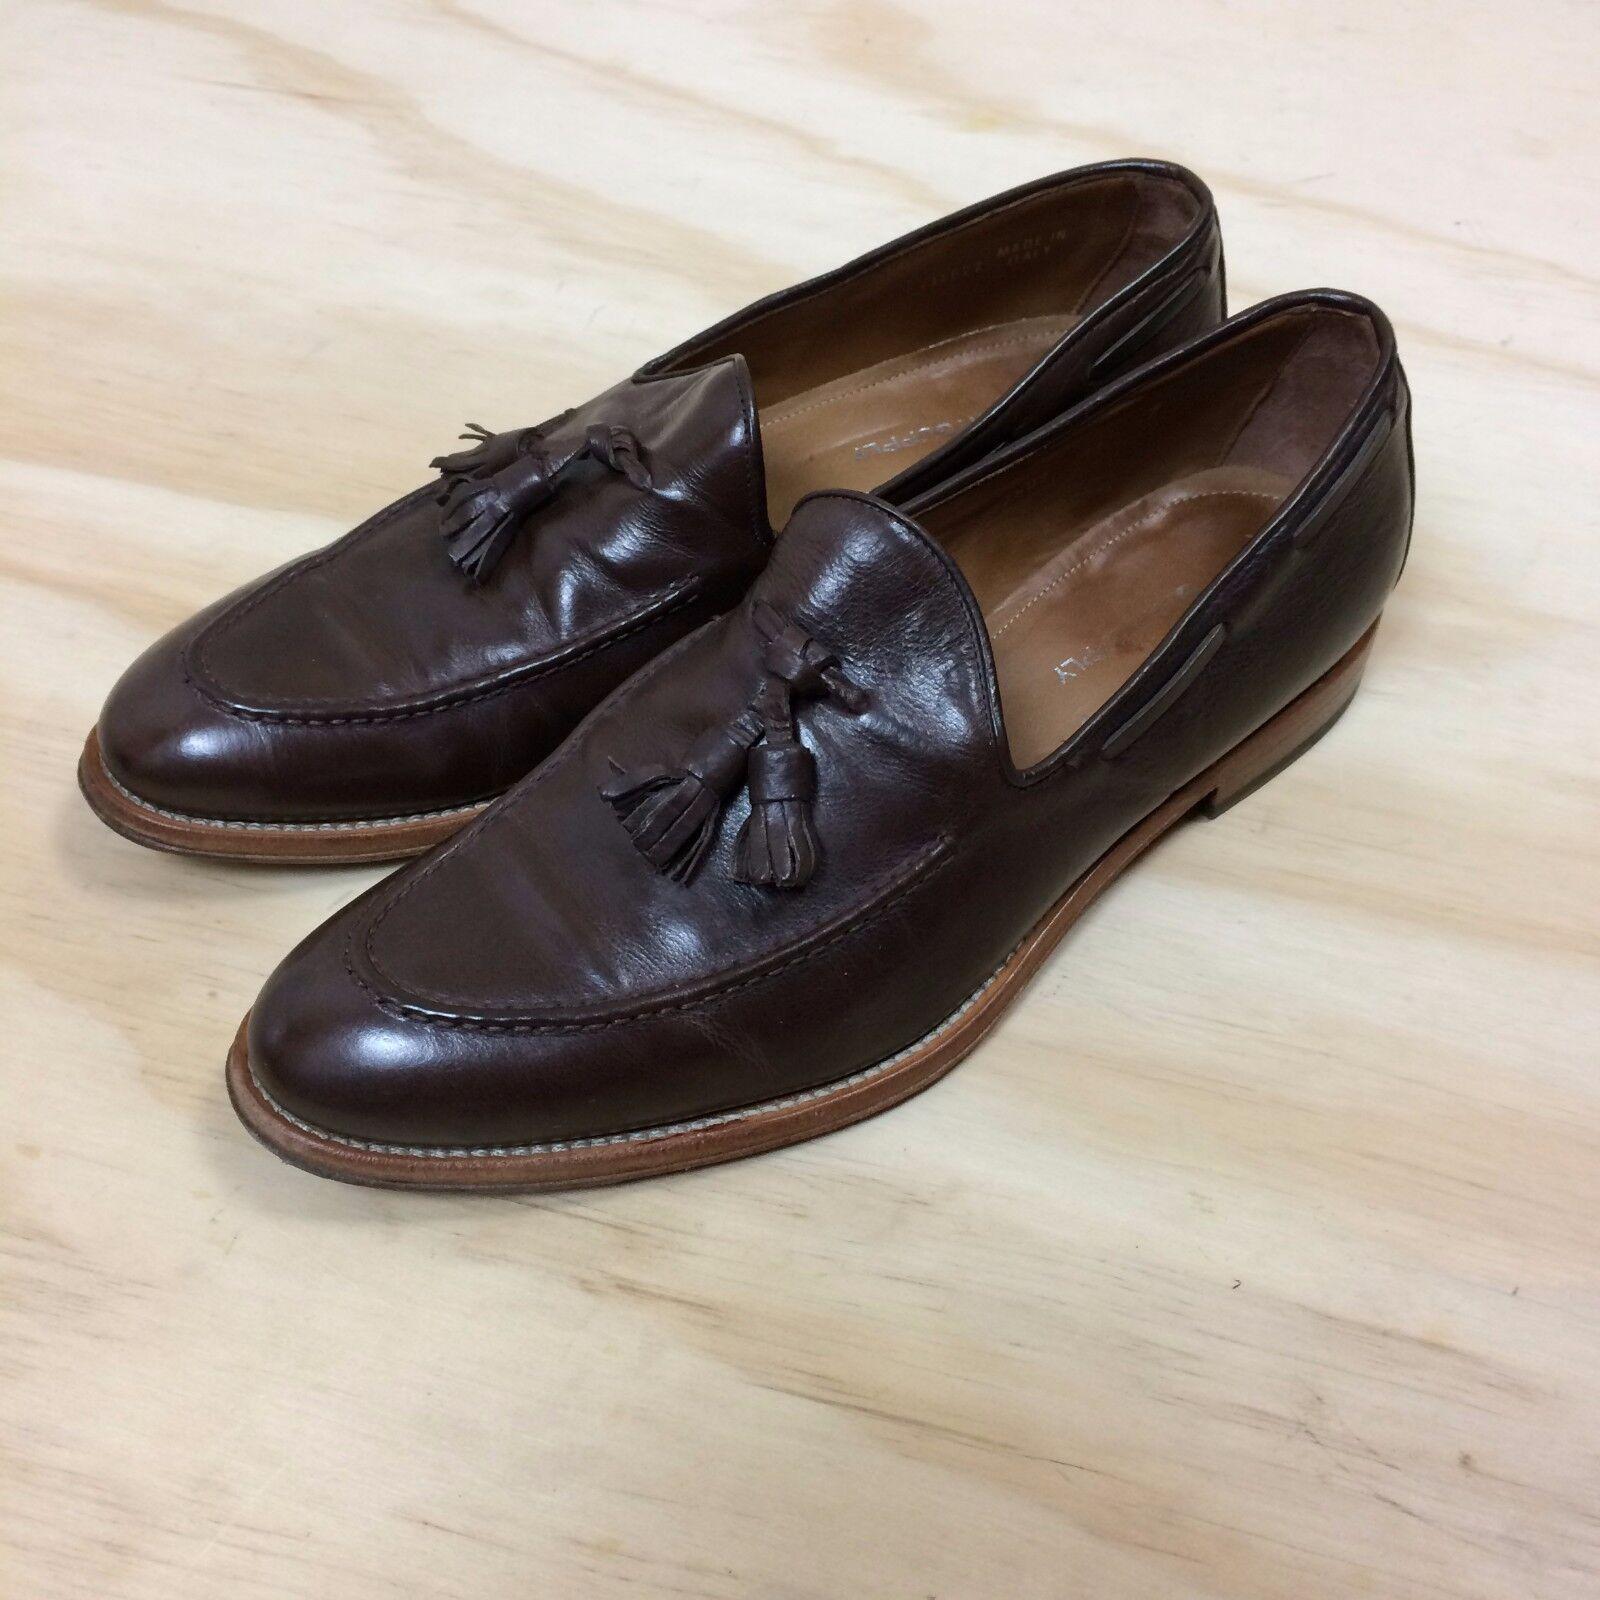 Antonio Maurizi 41/US 11 Brown Pelle Moccasin Tassel Moccasin Pelle Toe Dress Slip-On Loafers 1bcca8